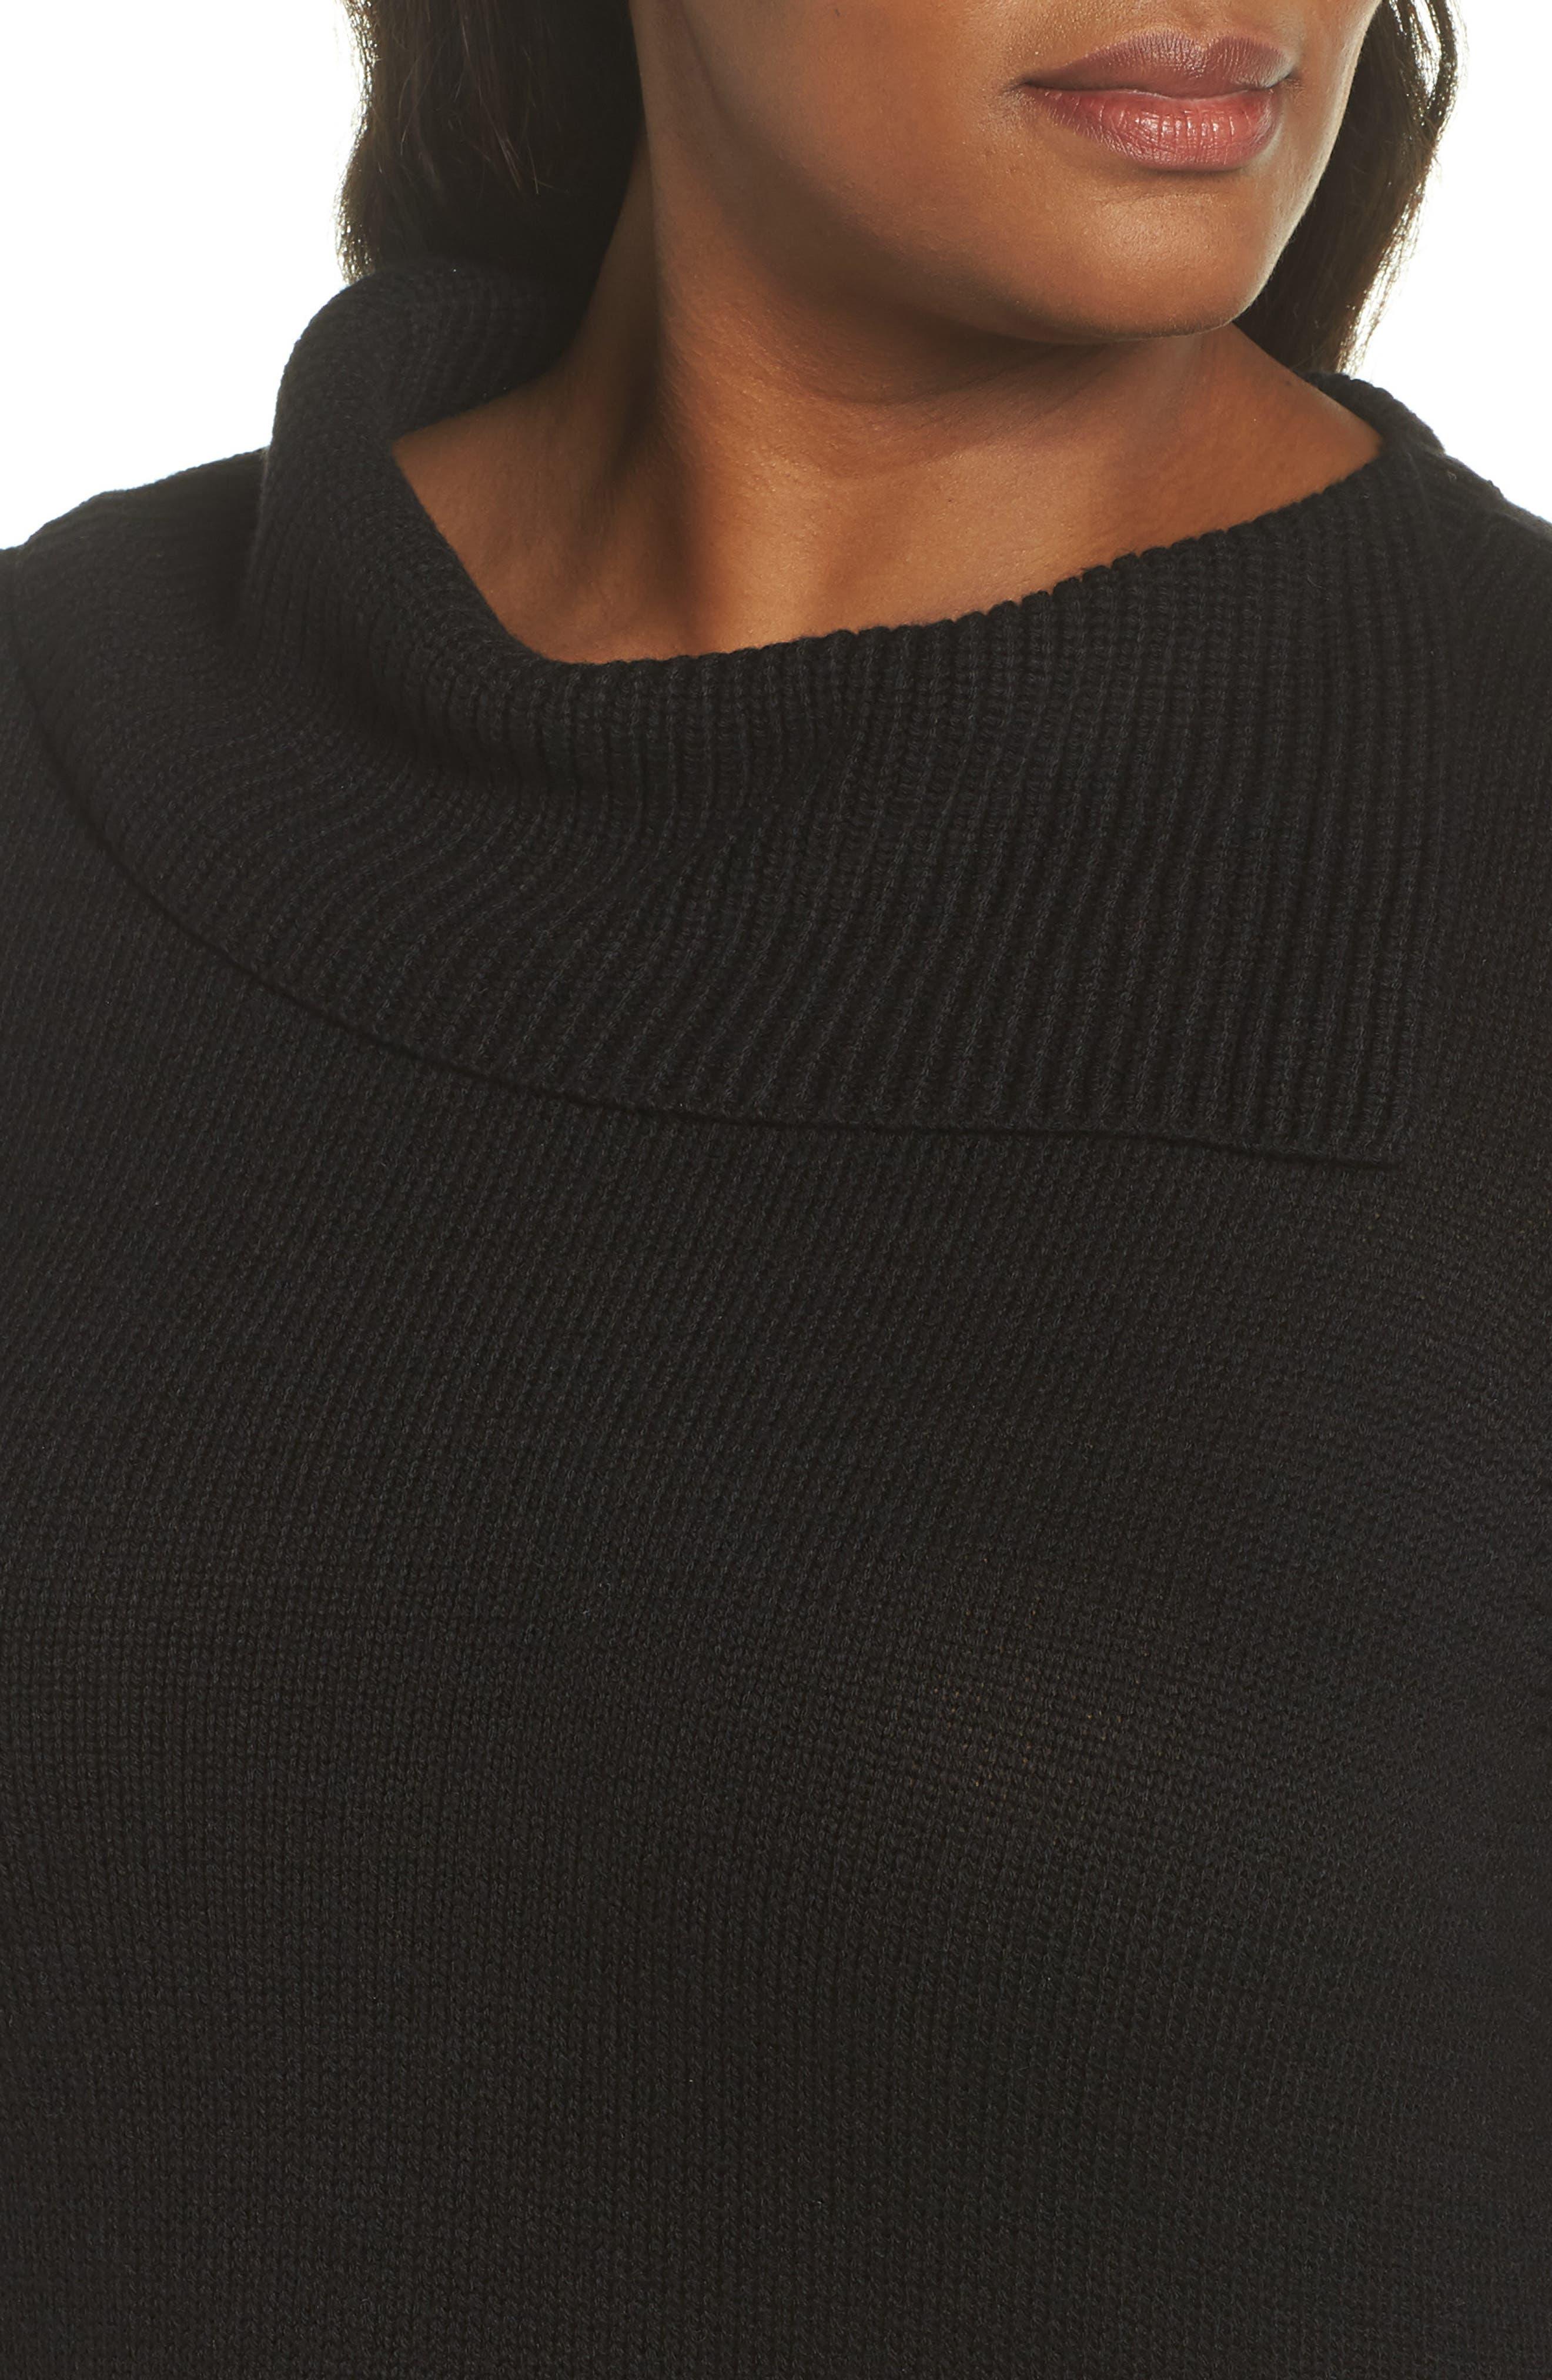 Split Neck Sweater,                             Alternate thumbnail 4, color,                             BLACK